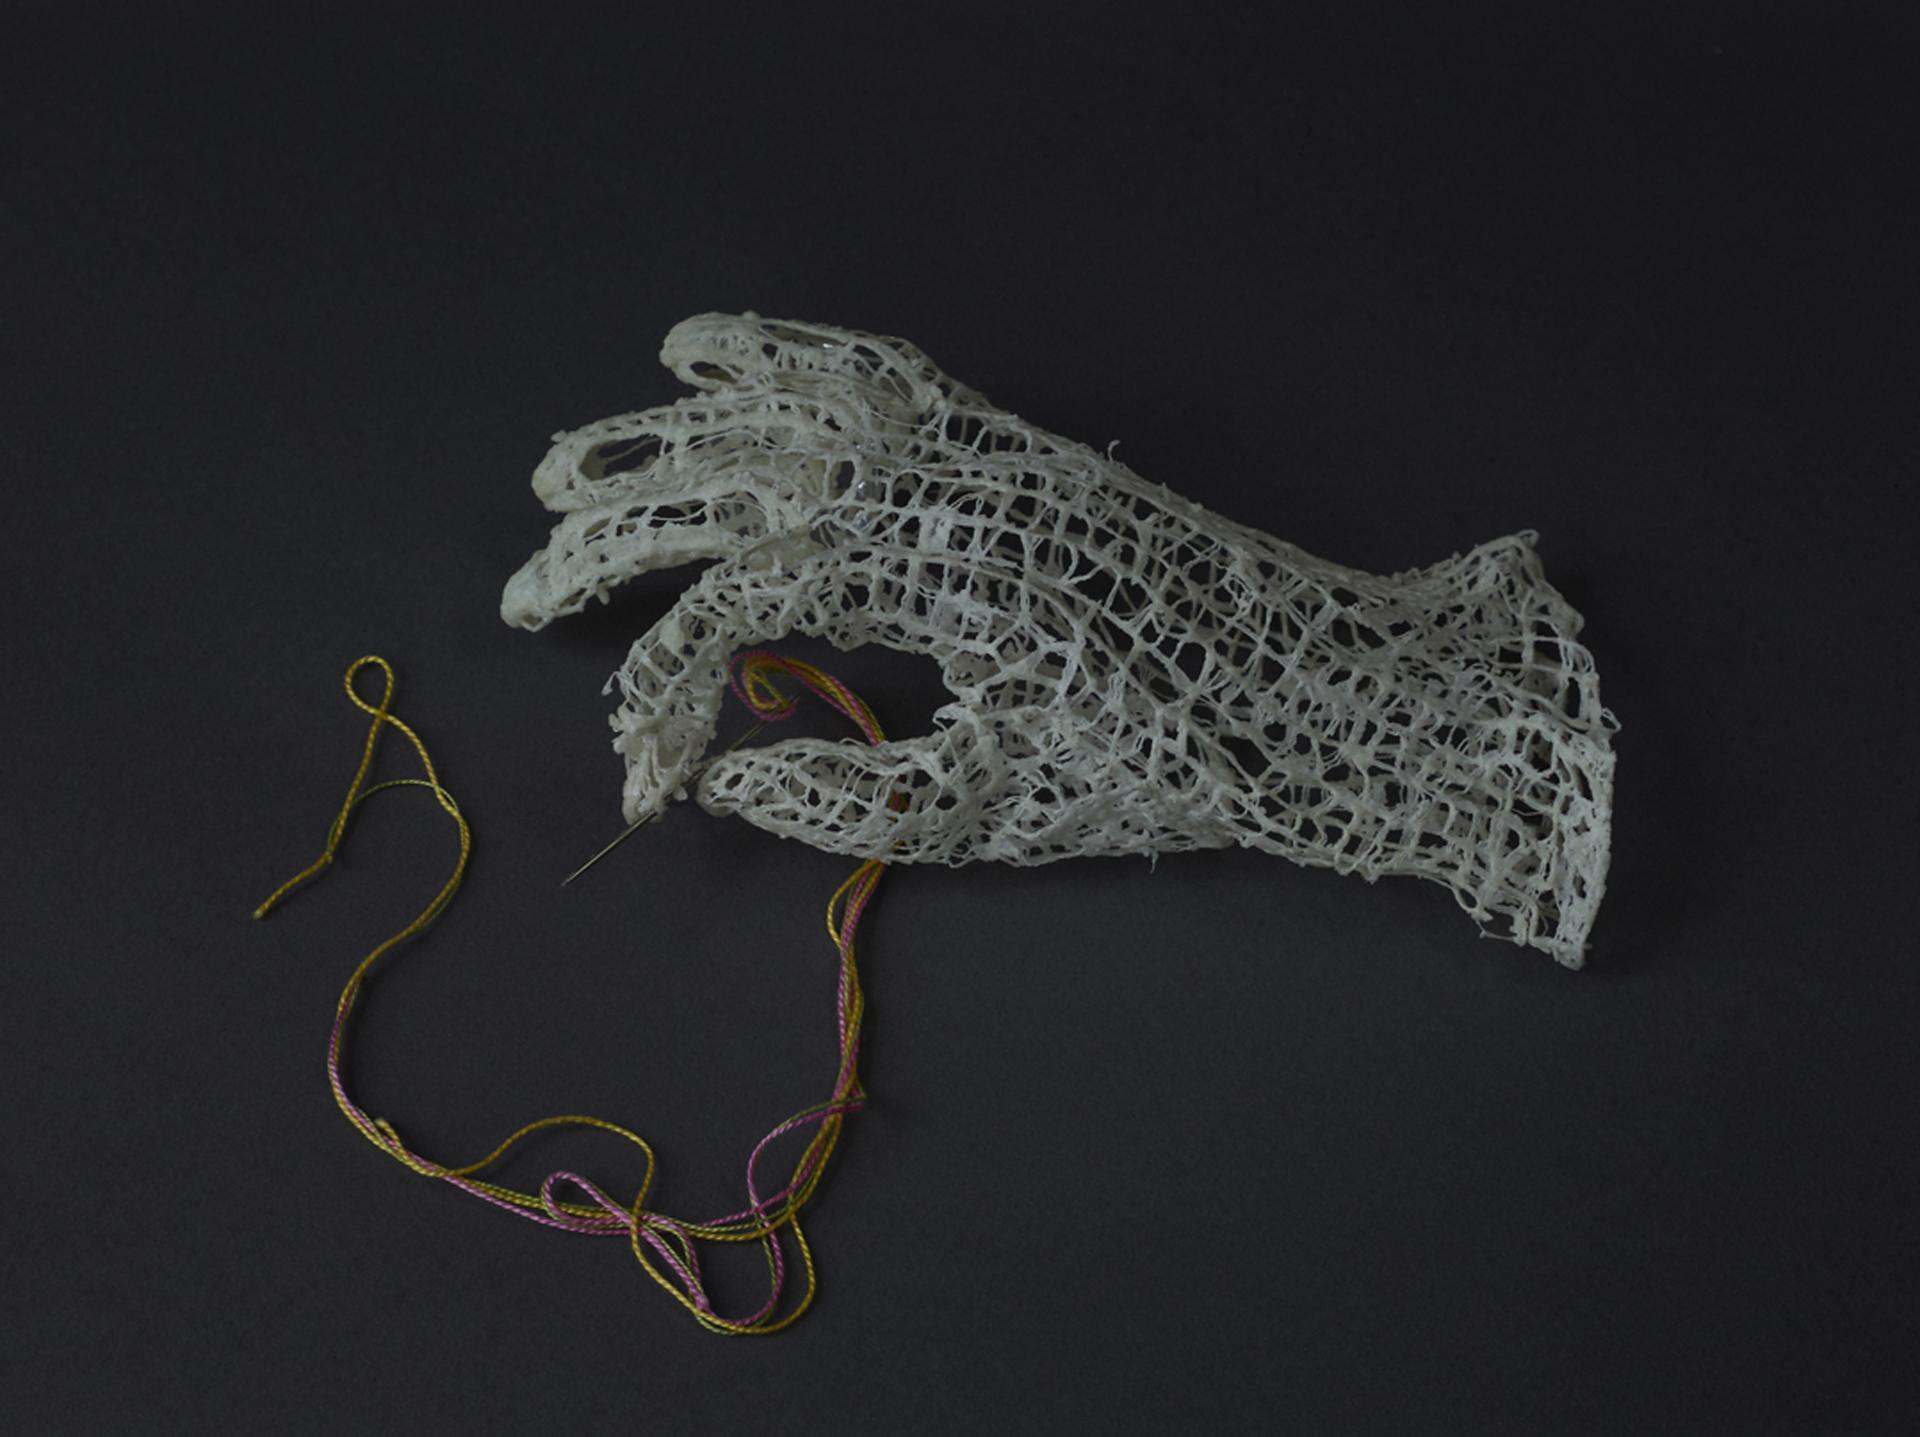 "Maura Donegan  ""Humankind,"" 2015  silk organza, raton thread, wire, needle, perle coton, encau  Issaquah, WA  3""x9""x5""  $1,200"